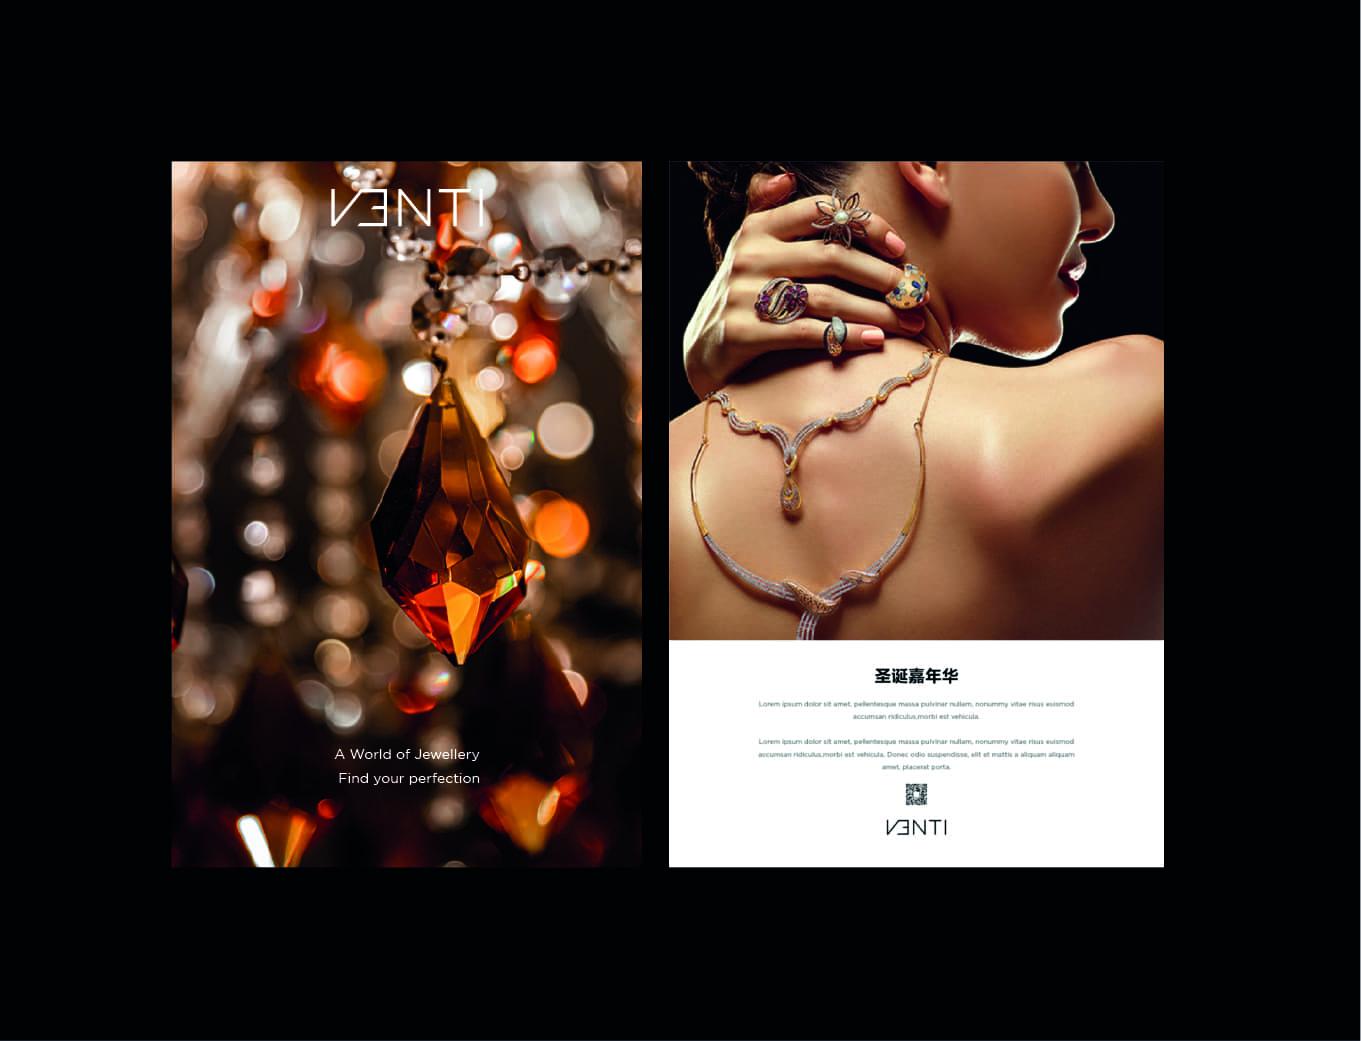 Venti premium women jewellery luxury brand activation model posing with jewel neckless